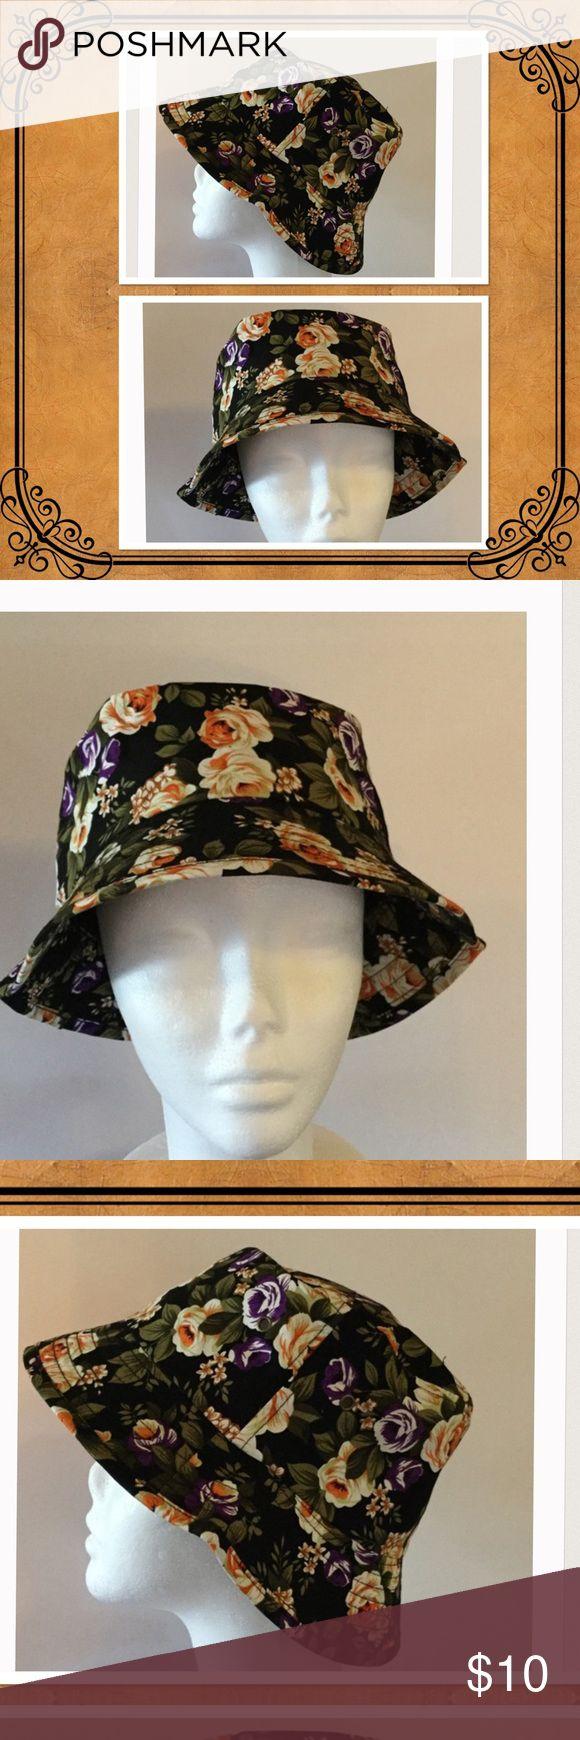 🌻Floral Bucket Hat, NWOT So chic floral bucket hat, 100% Cotton BK Accessories Hats